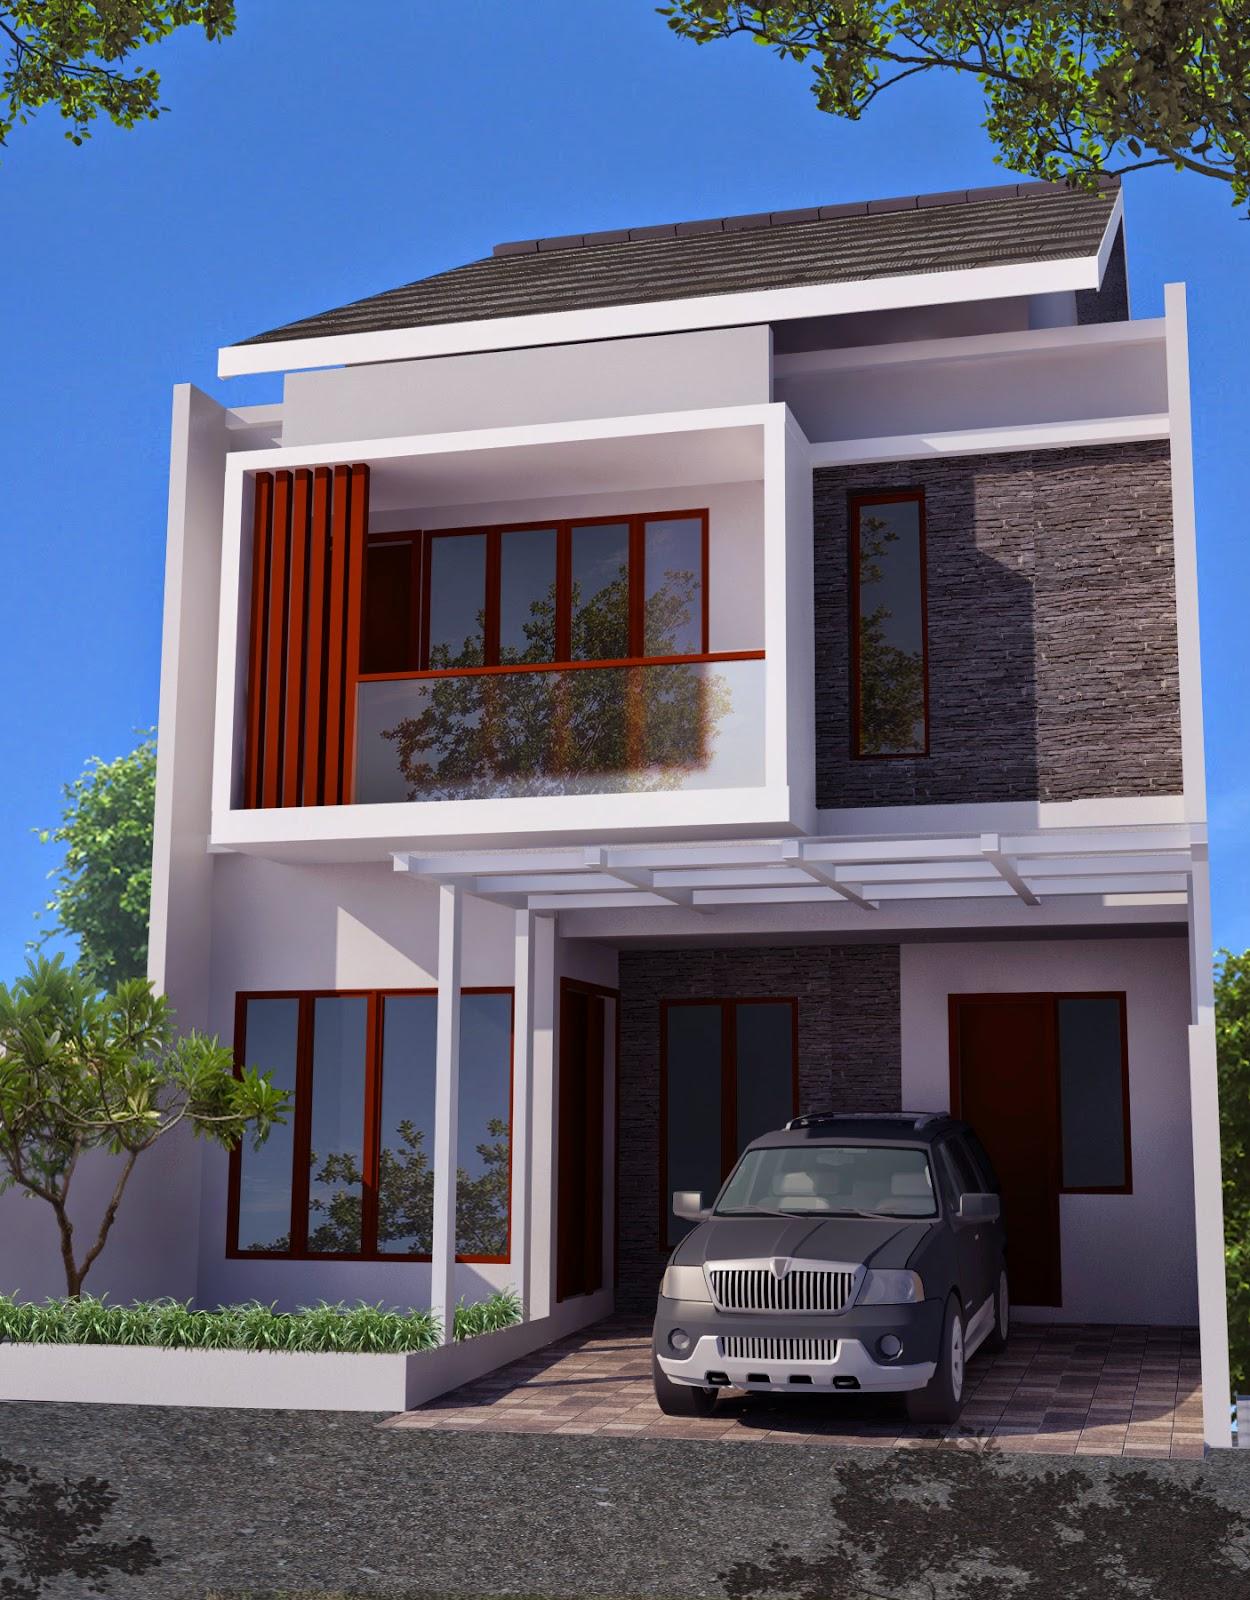 10 desain denah rumah minimalis modern 2 lantai type 45 - Desain Rumah Minimalis 2 Lantai Lebar 10 Meter